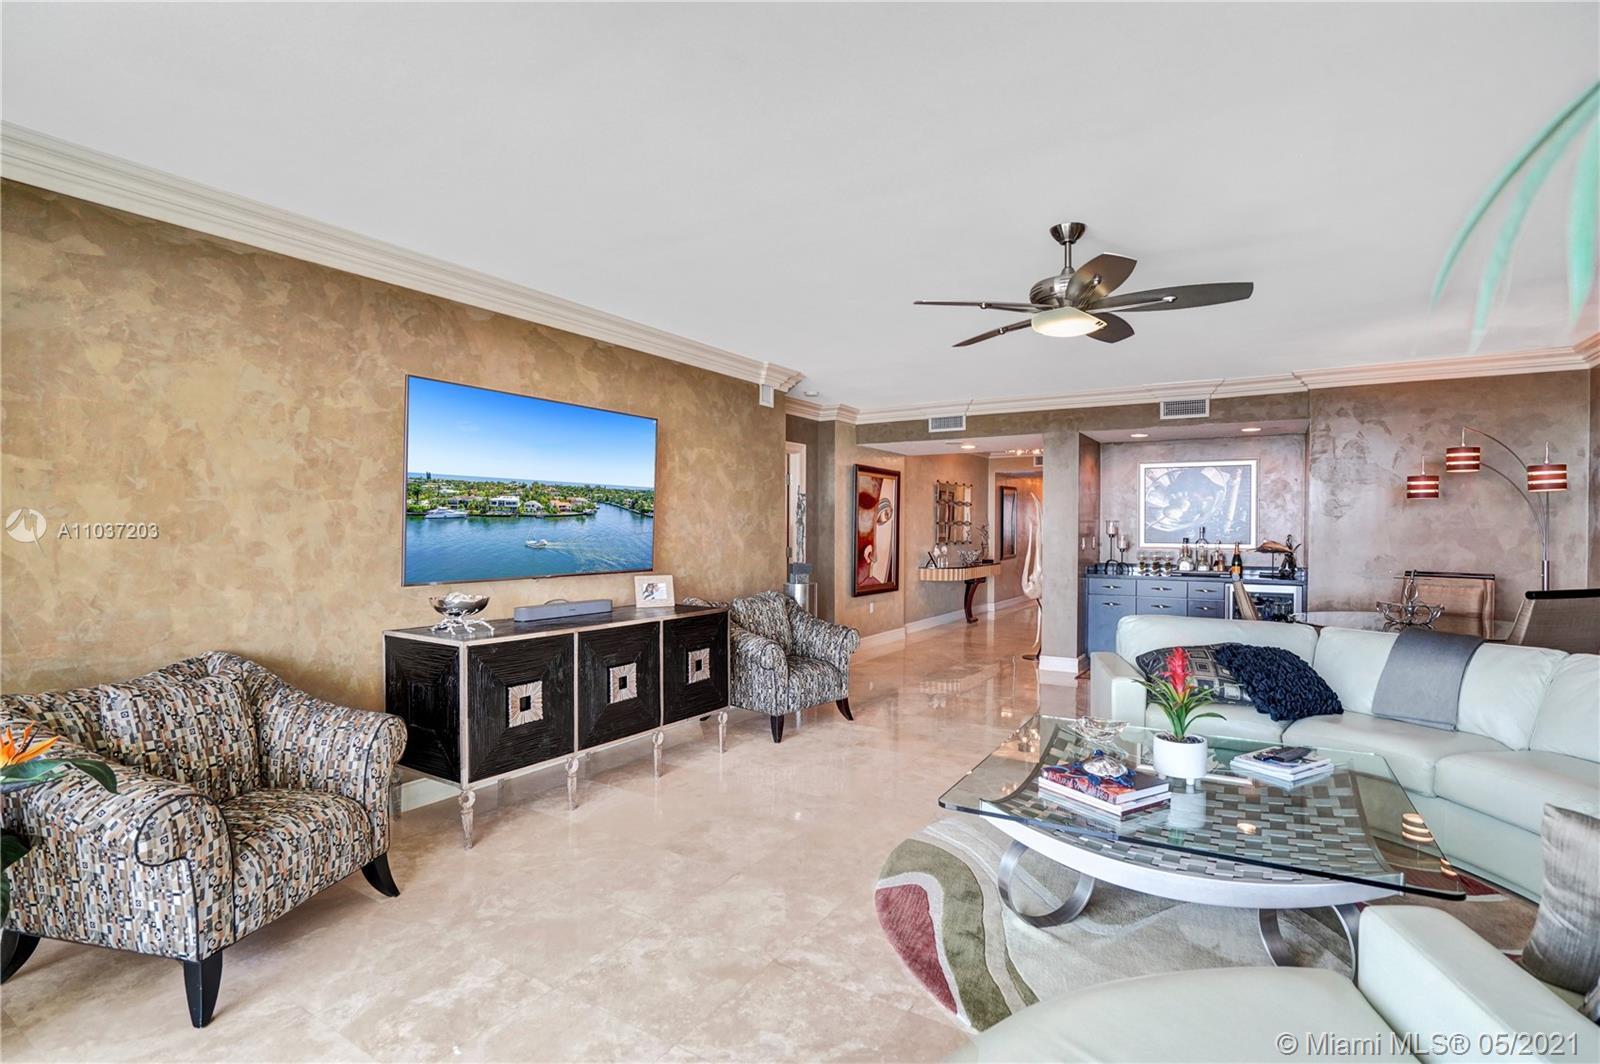 Photo of 20201 Country Club Dr #1006, Aventura, Florida, 33180 - Elegant entrance, private elevator.